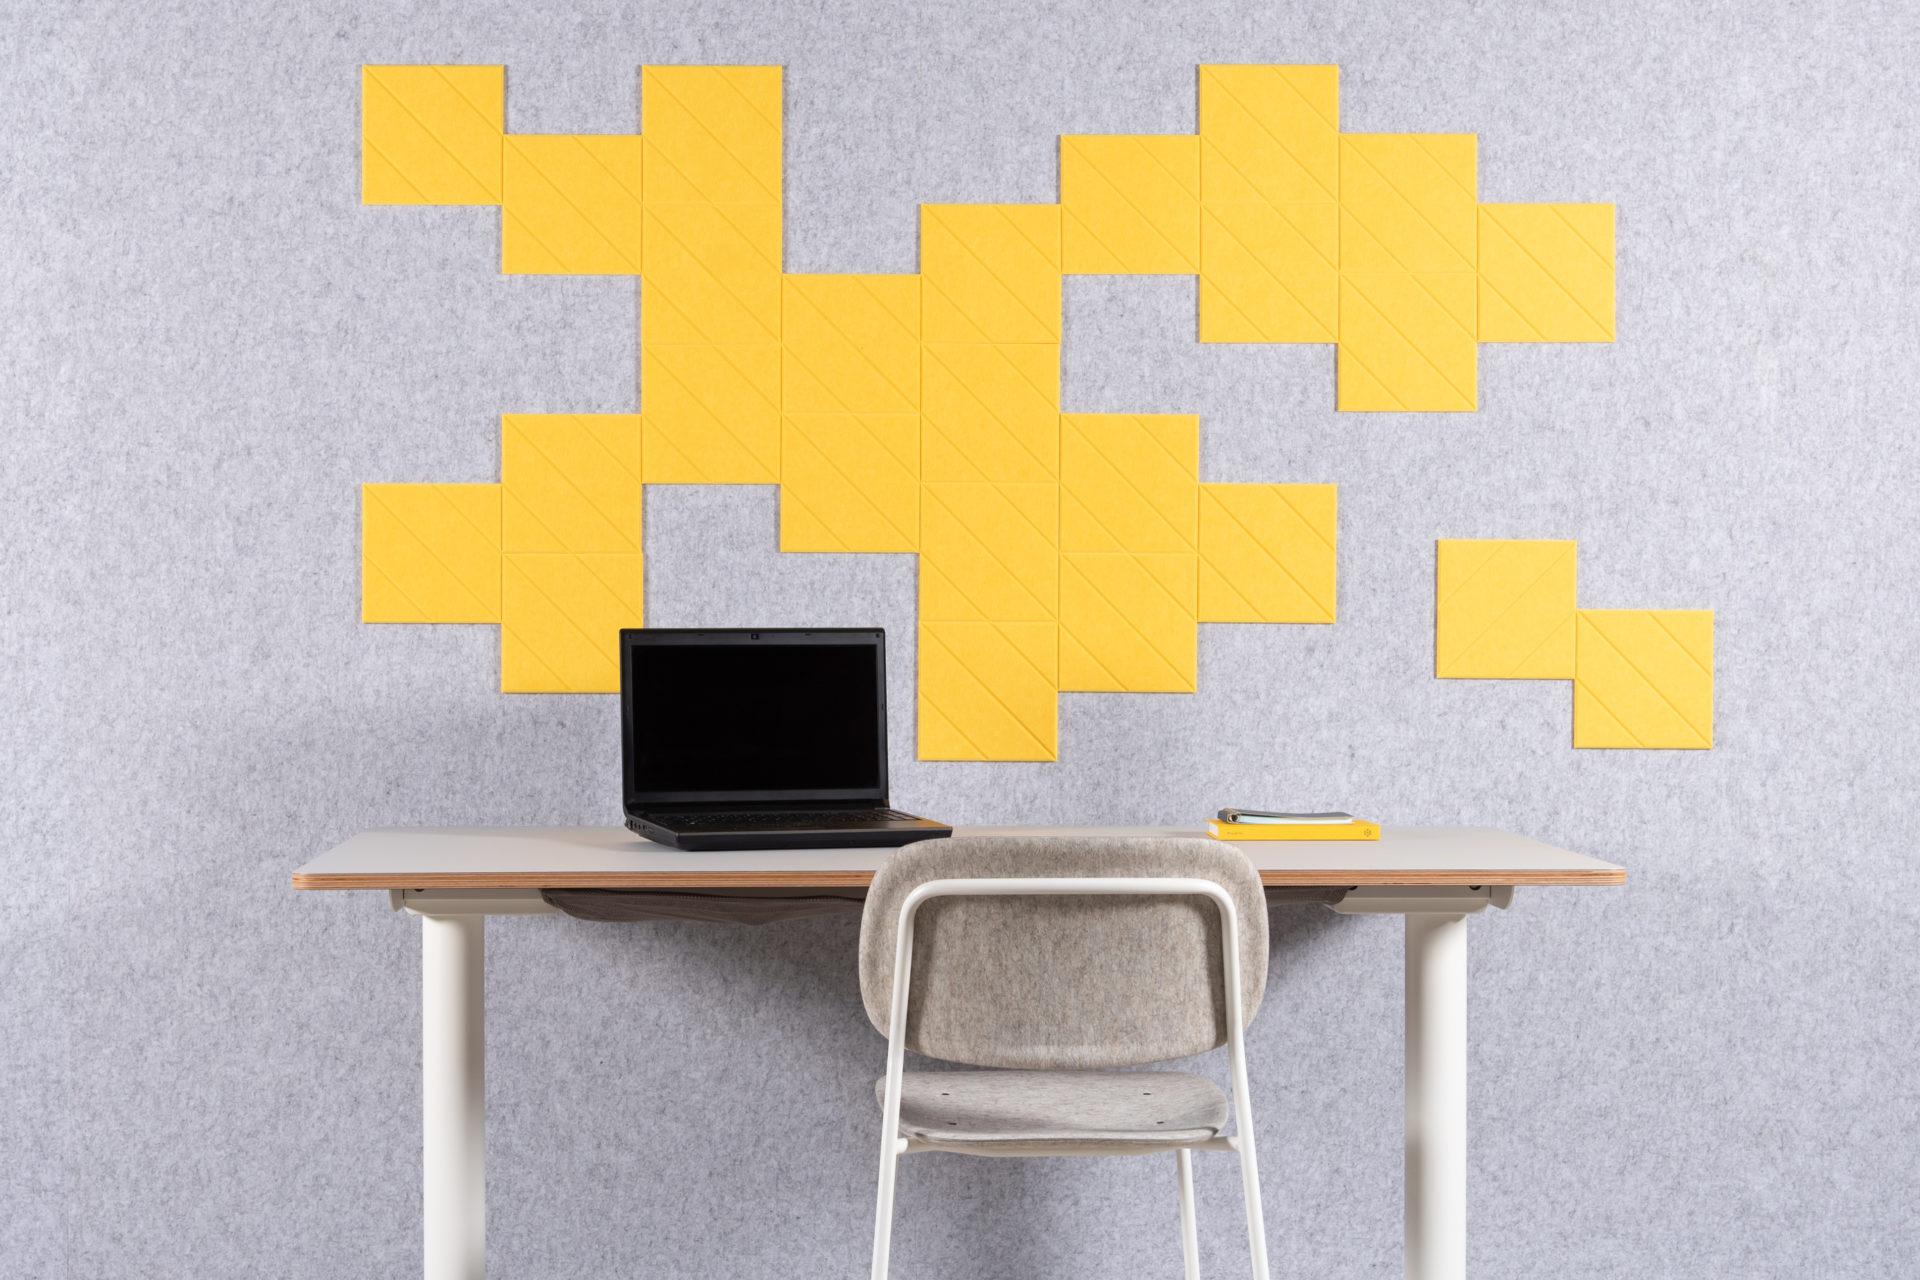 ReFelt PET Felt Diagonal Tiles Small for home office